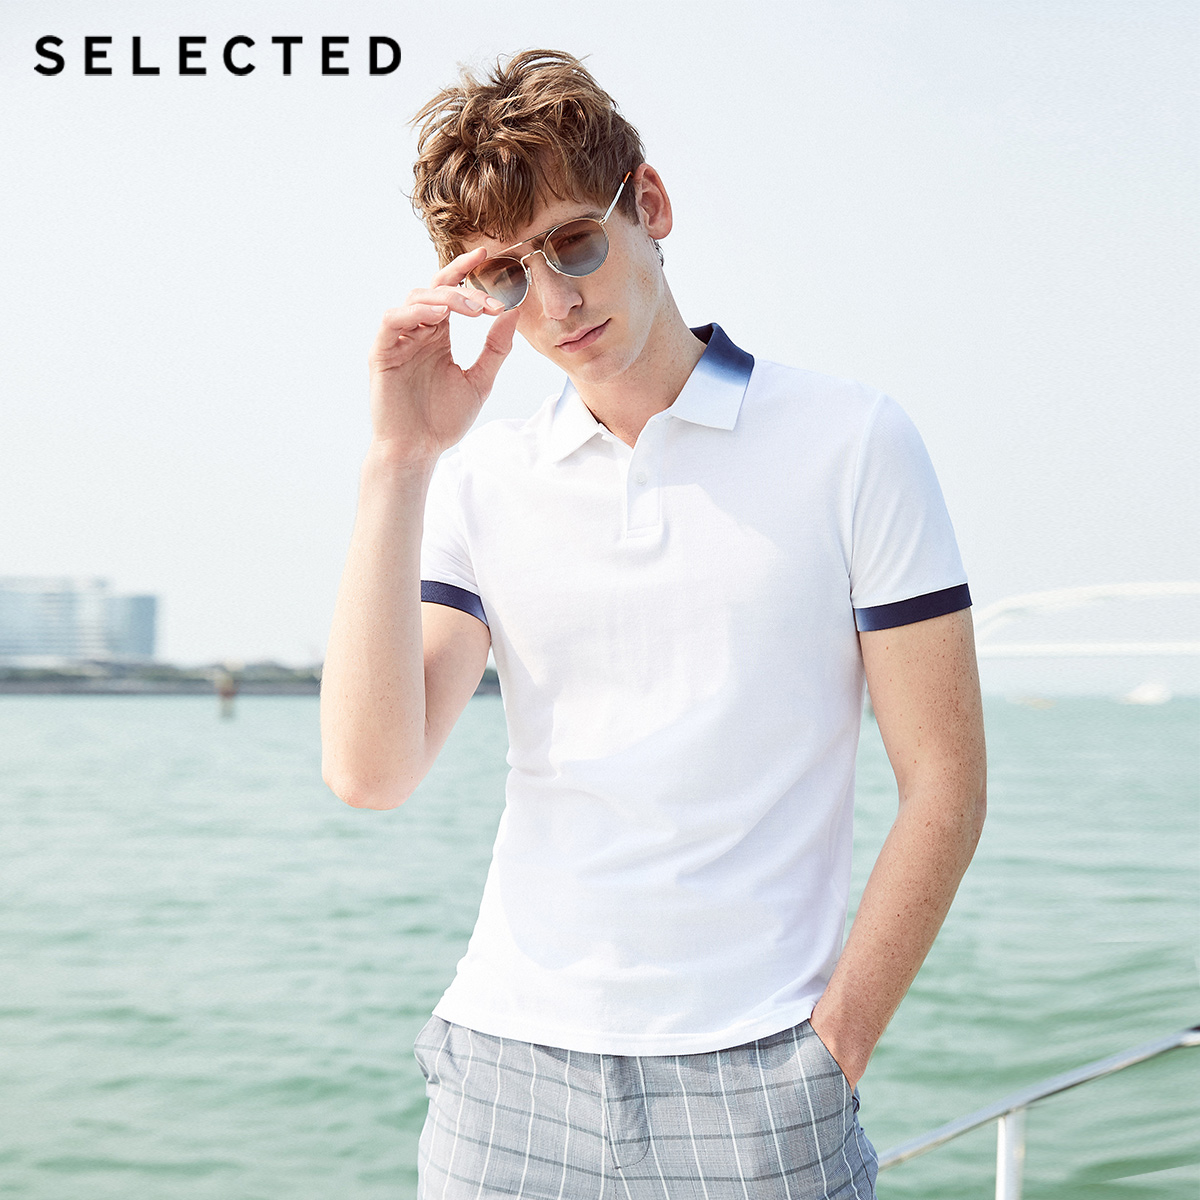 SELECTED Men's Slim Fit 100% Cotton Turn-down Collar Poloshirt C 419206545